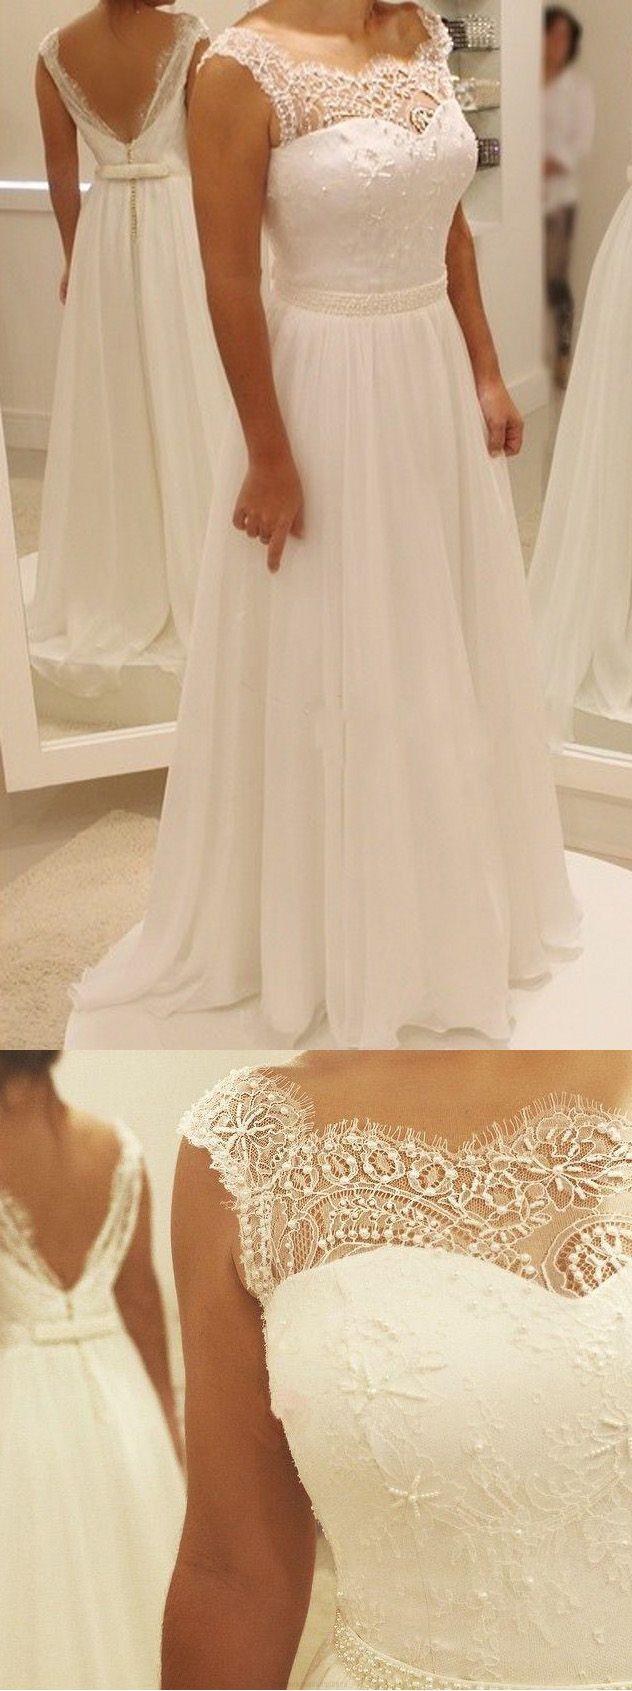 Square wedding dresses white long wedding dresses beautiful